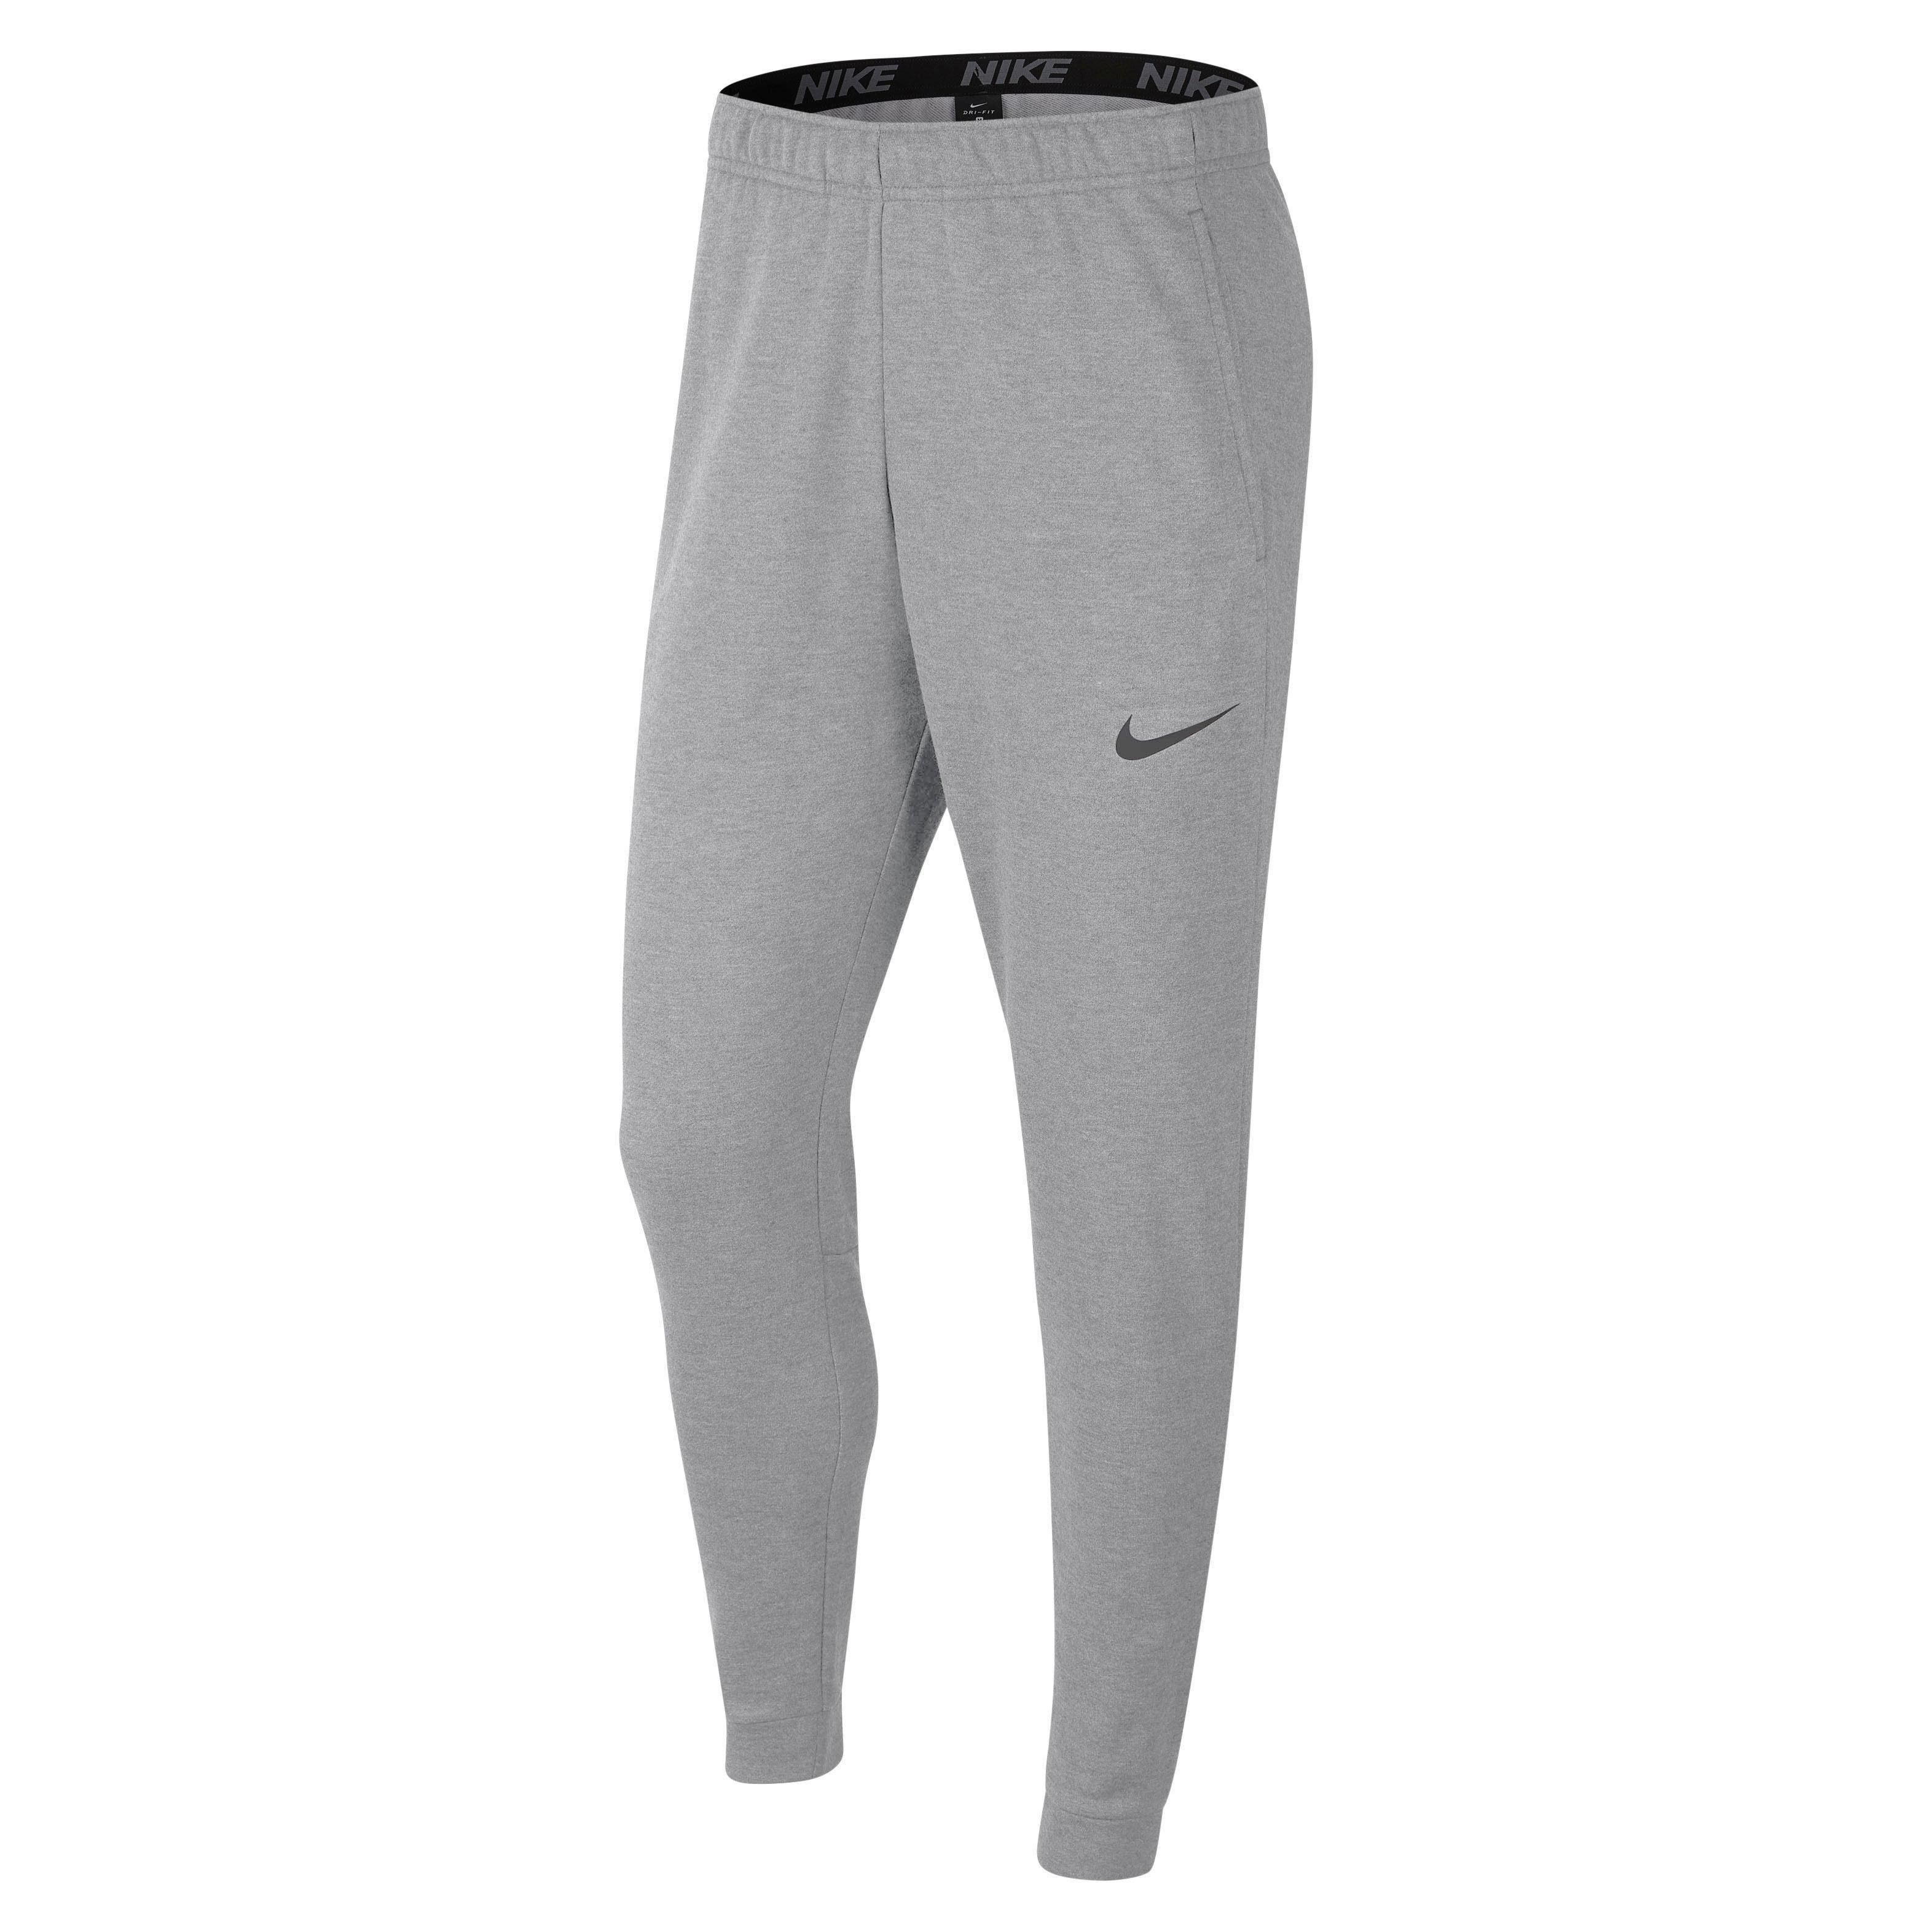 Nike Trainingshose »Nike Dri FIT Men's Fleece Training Pants« online kaufen | OTTO